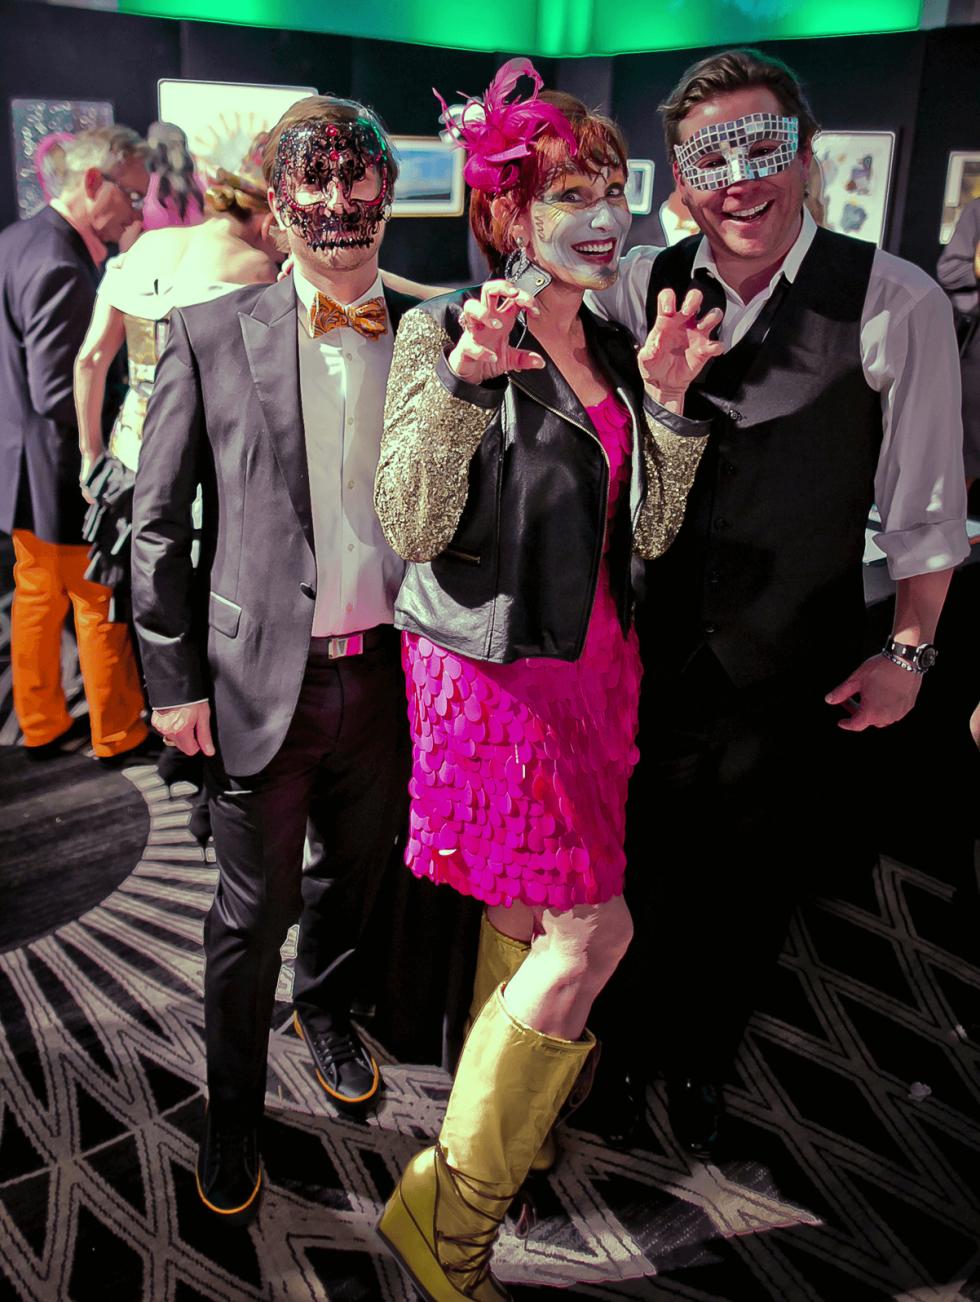 Houston, Orange Show gala, Oct 2016, Patrick Jez, Curry Glassell, Christopher Mendel